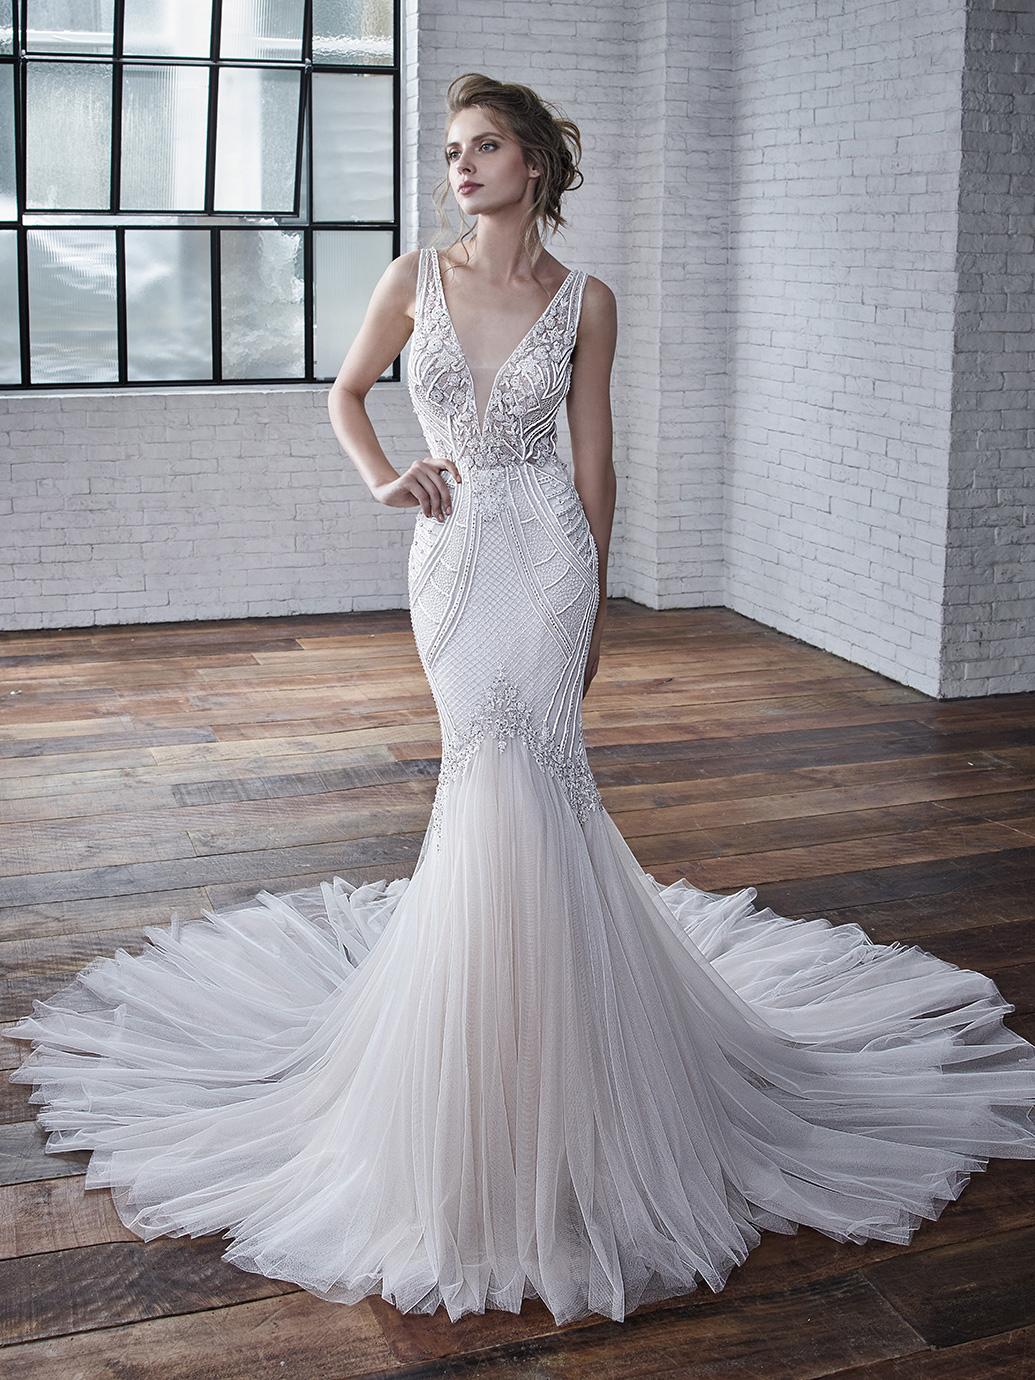 BM_Bride_2019_Pro_Charlize_Fro_Web.jpg